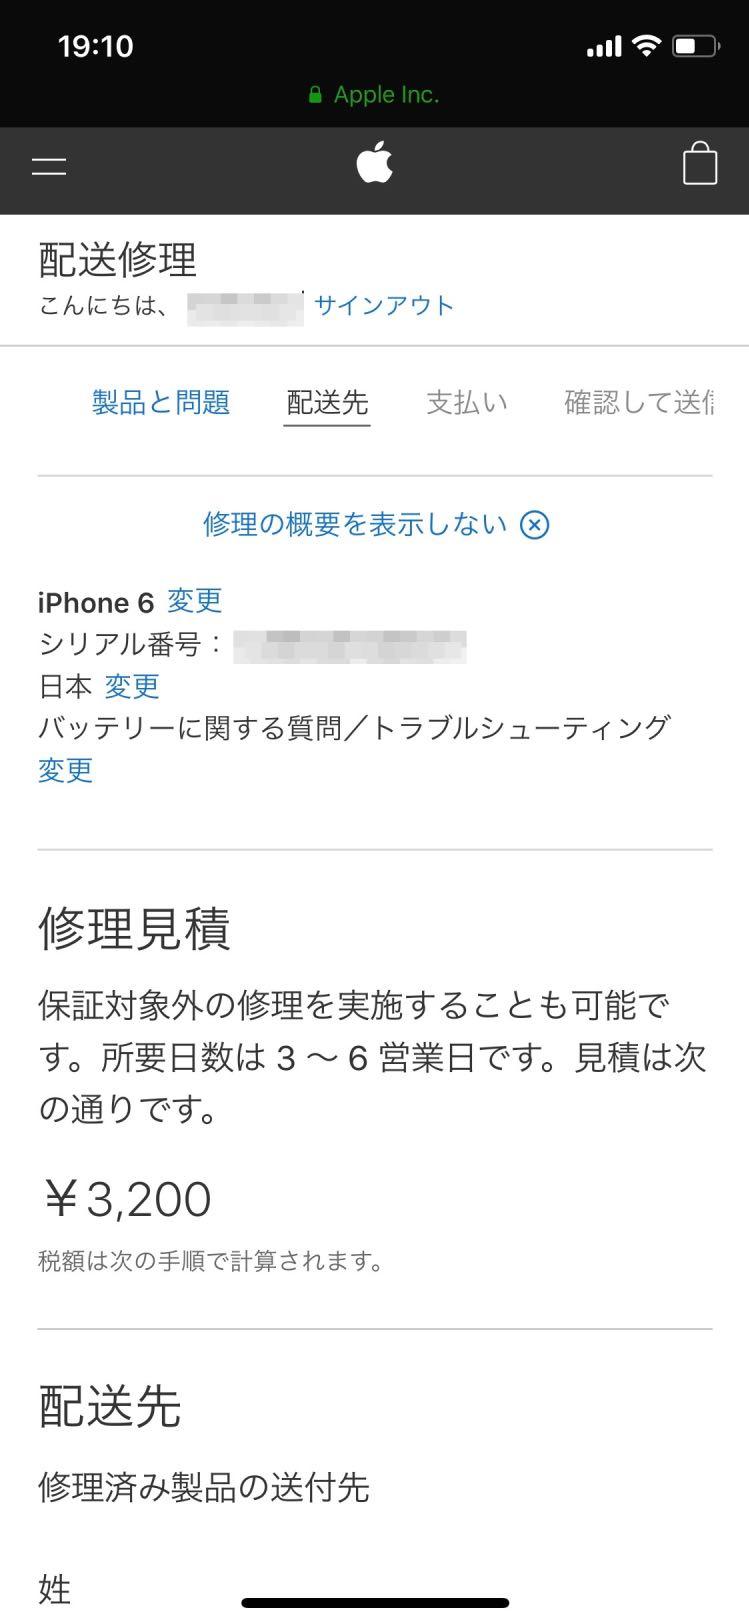 iPhone6バッテリー交換見積